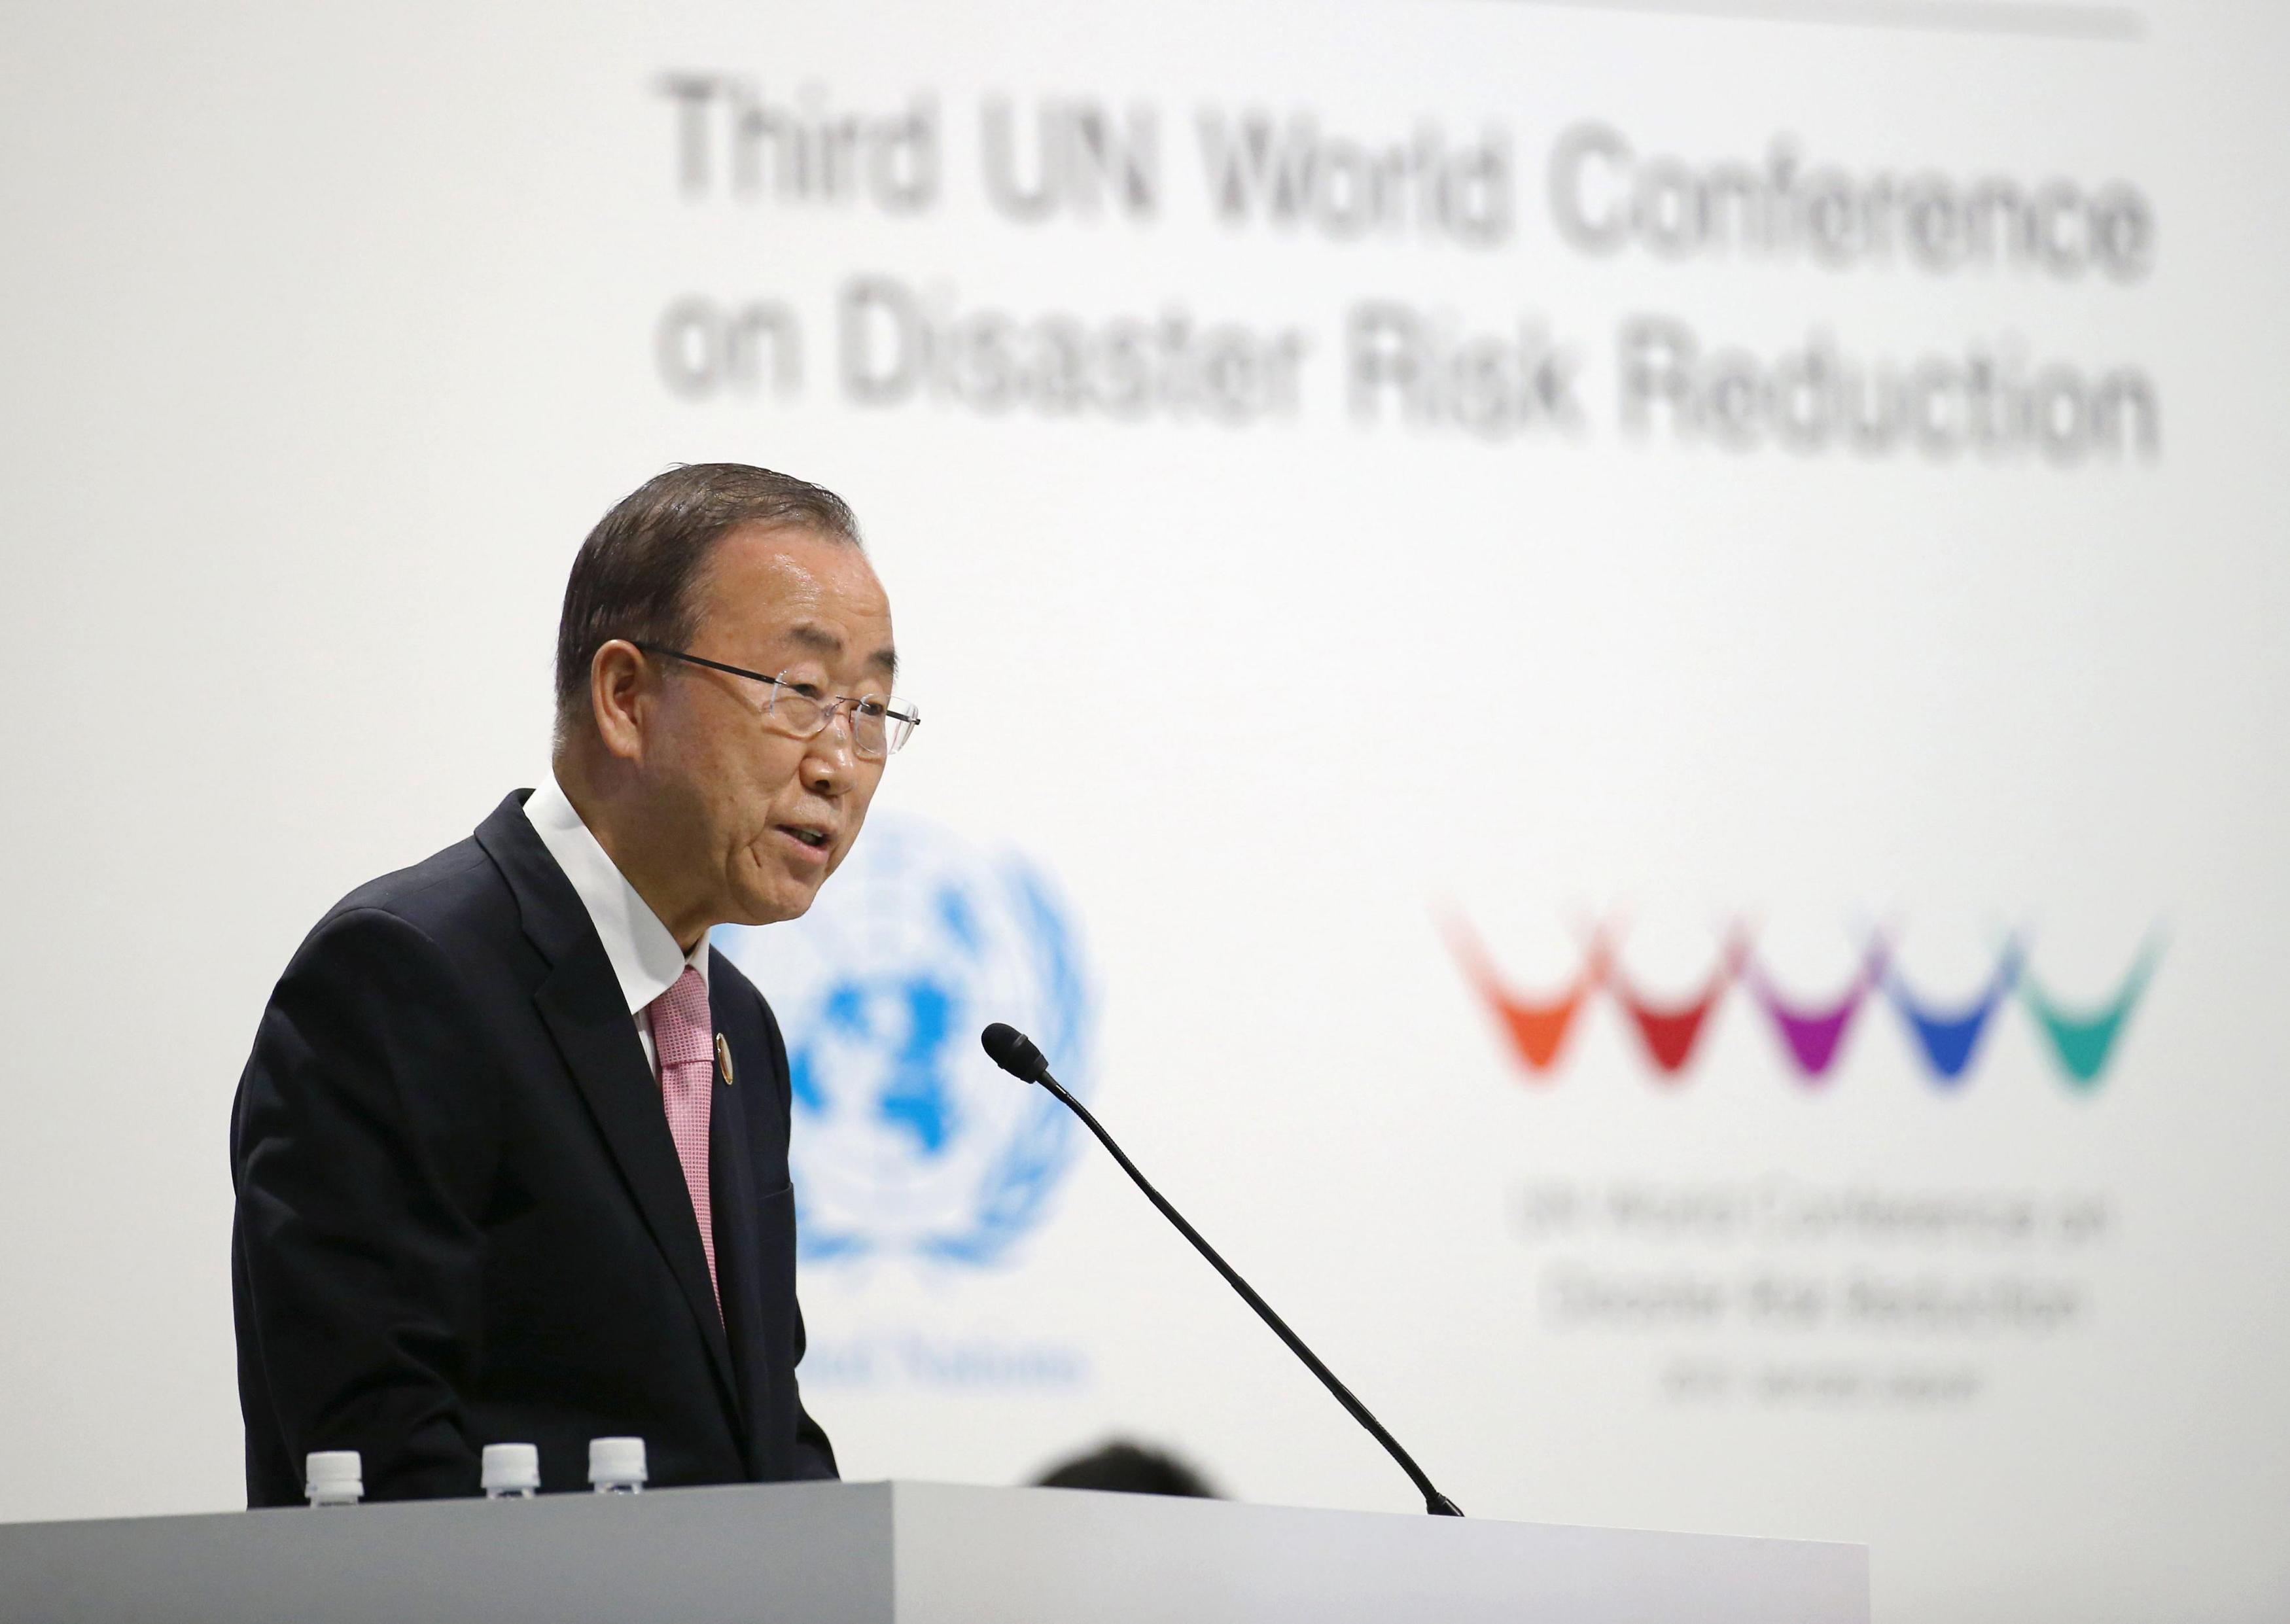 Ban ki moon avfardar kritiken